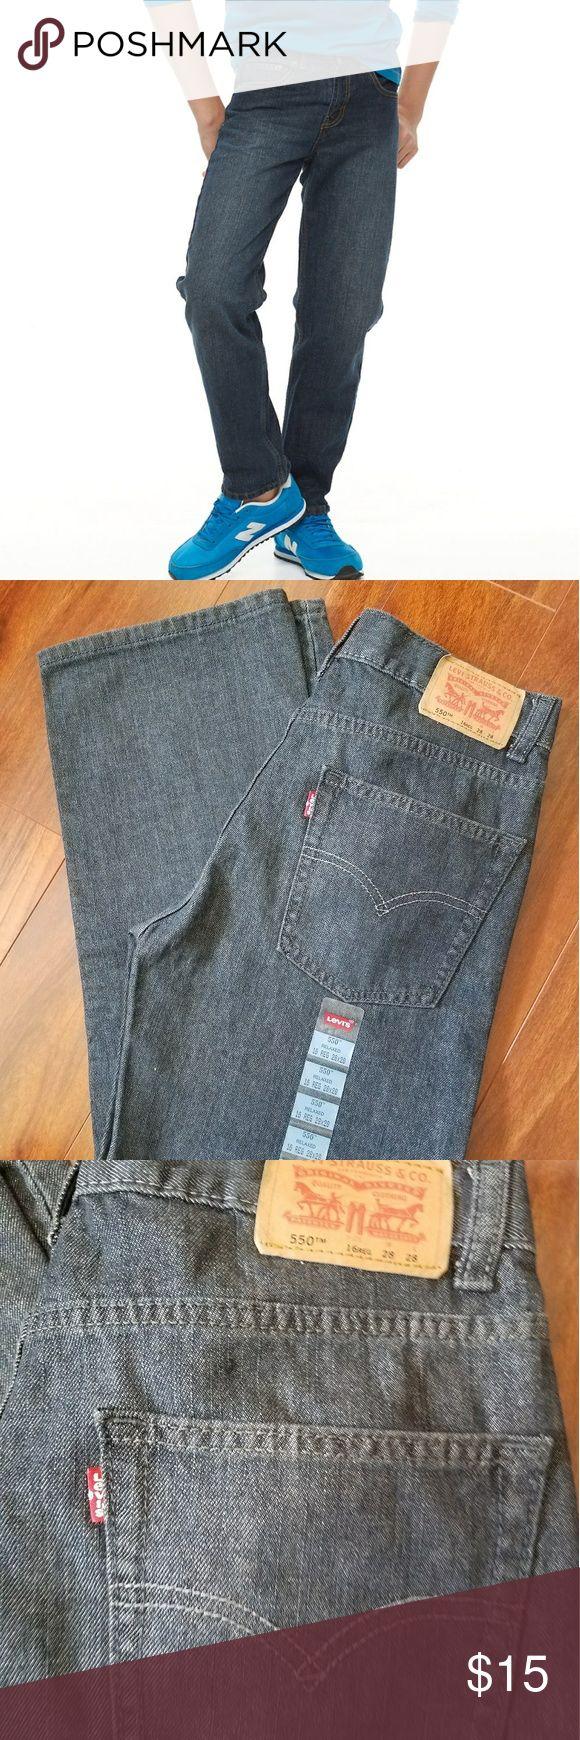 NWT Boys Levi's 550 Relaxed Jeans NWT boys medium-dark wash Levi jeans. Size  16 regular. Waist 28 Length 28. Levi's Bottoms Jeans